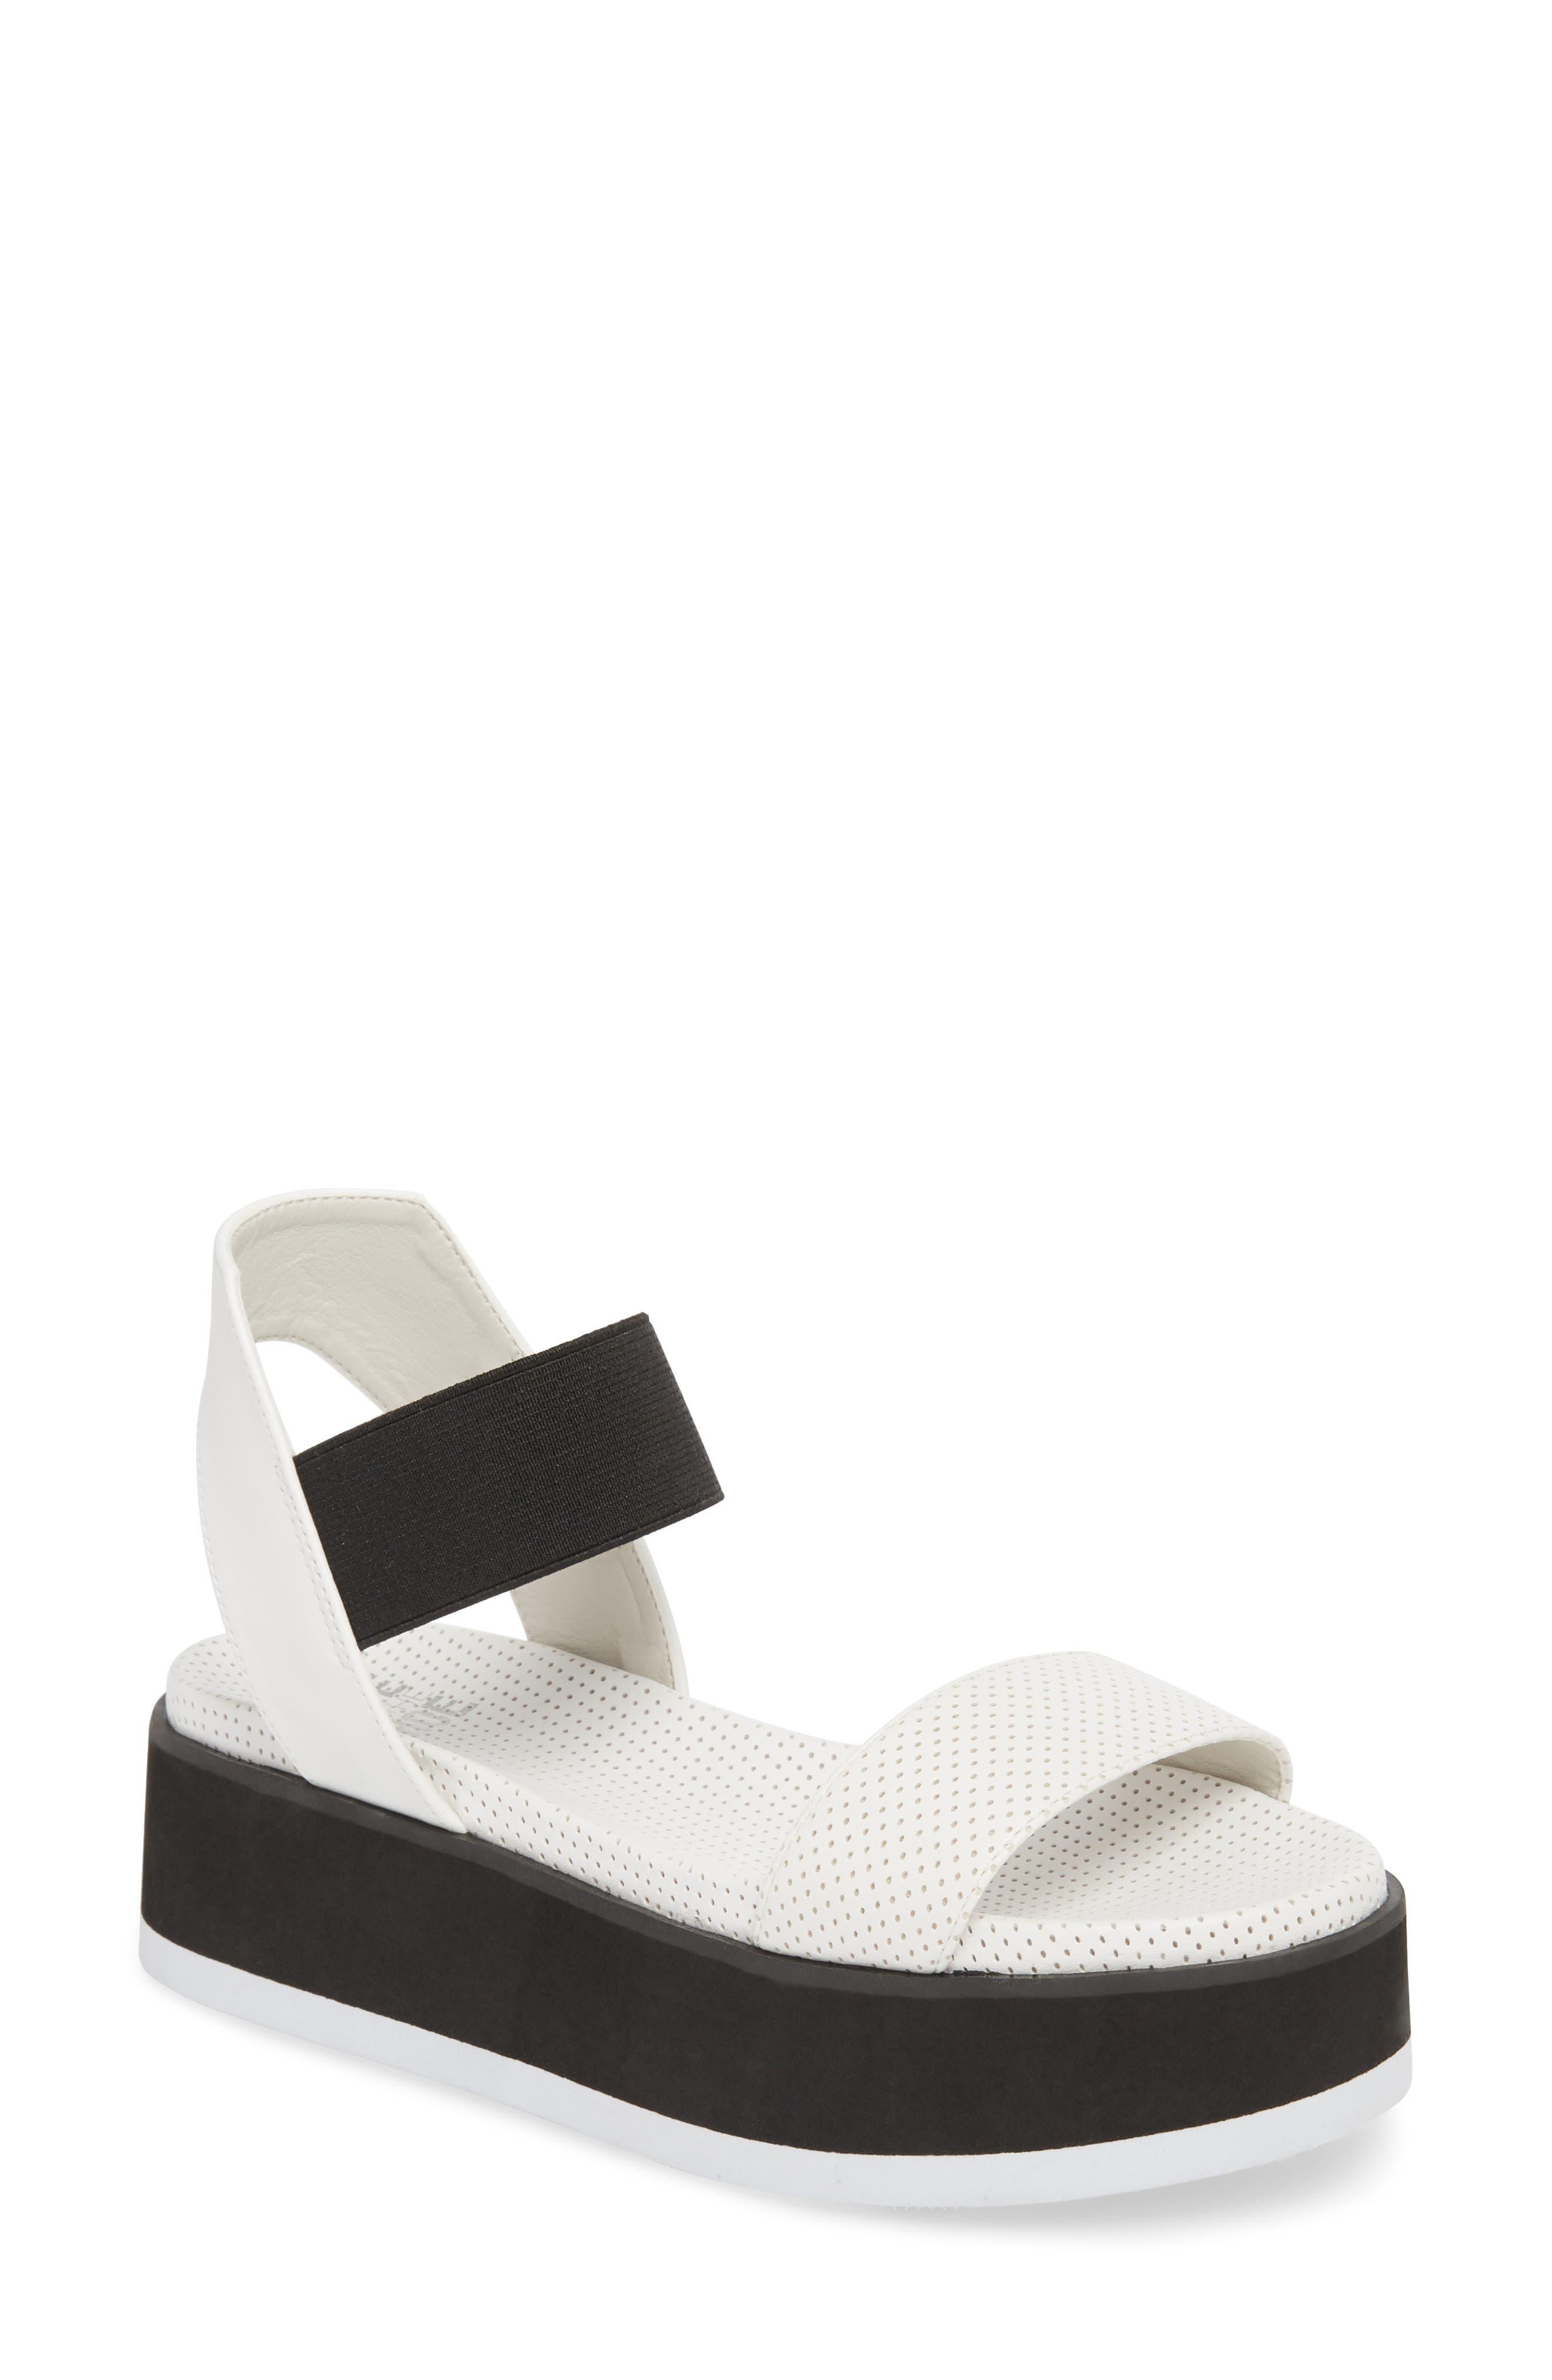 Josie Perforated Platform Sandal,                             Main thumbnail 1, color,                             White